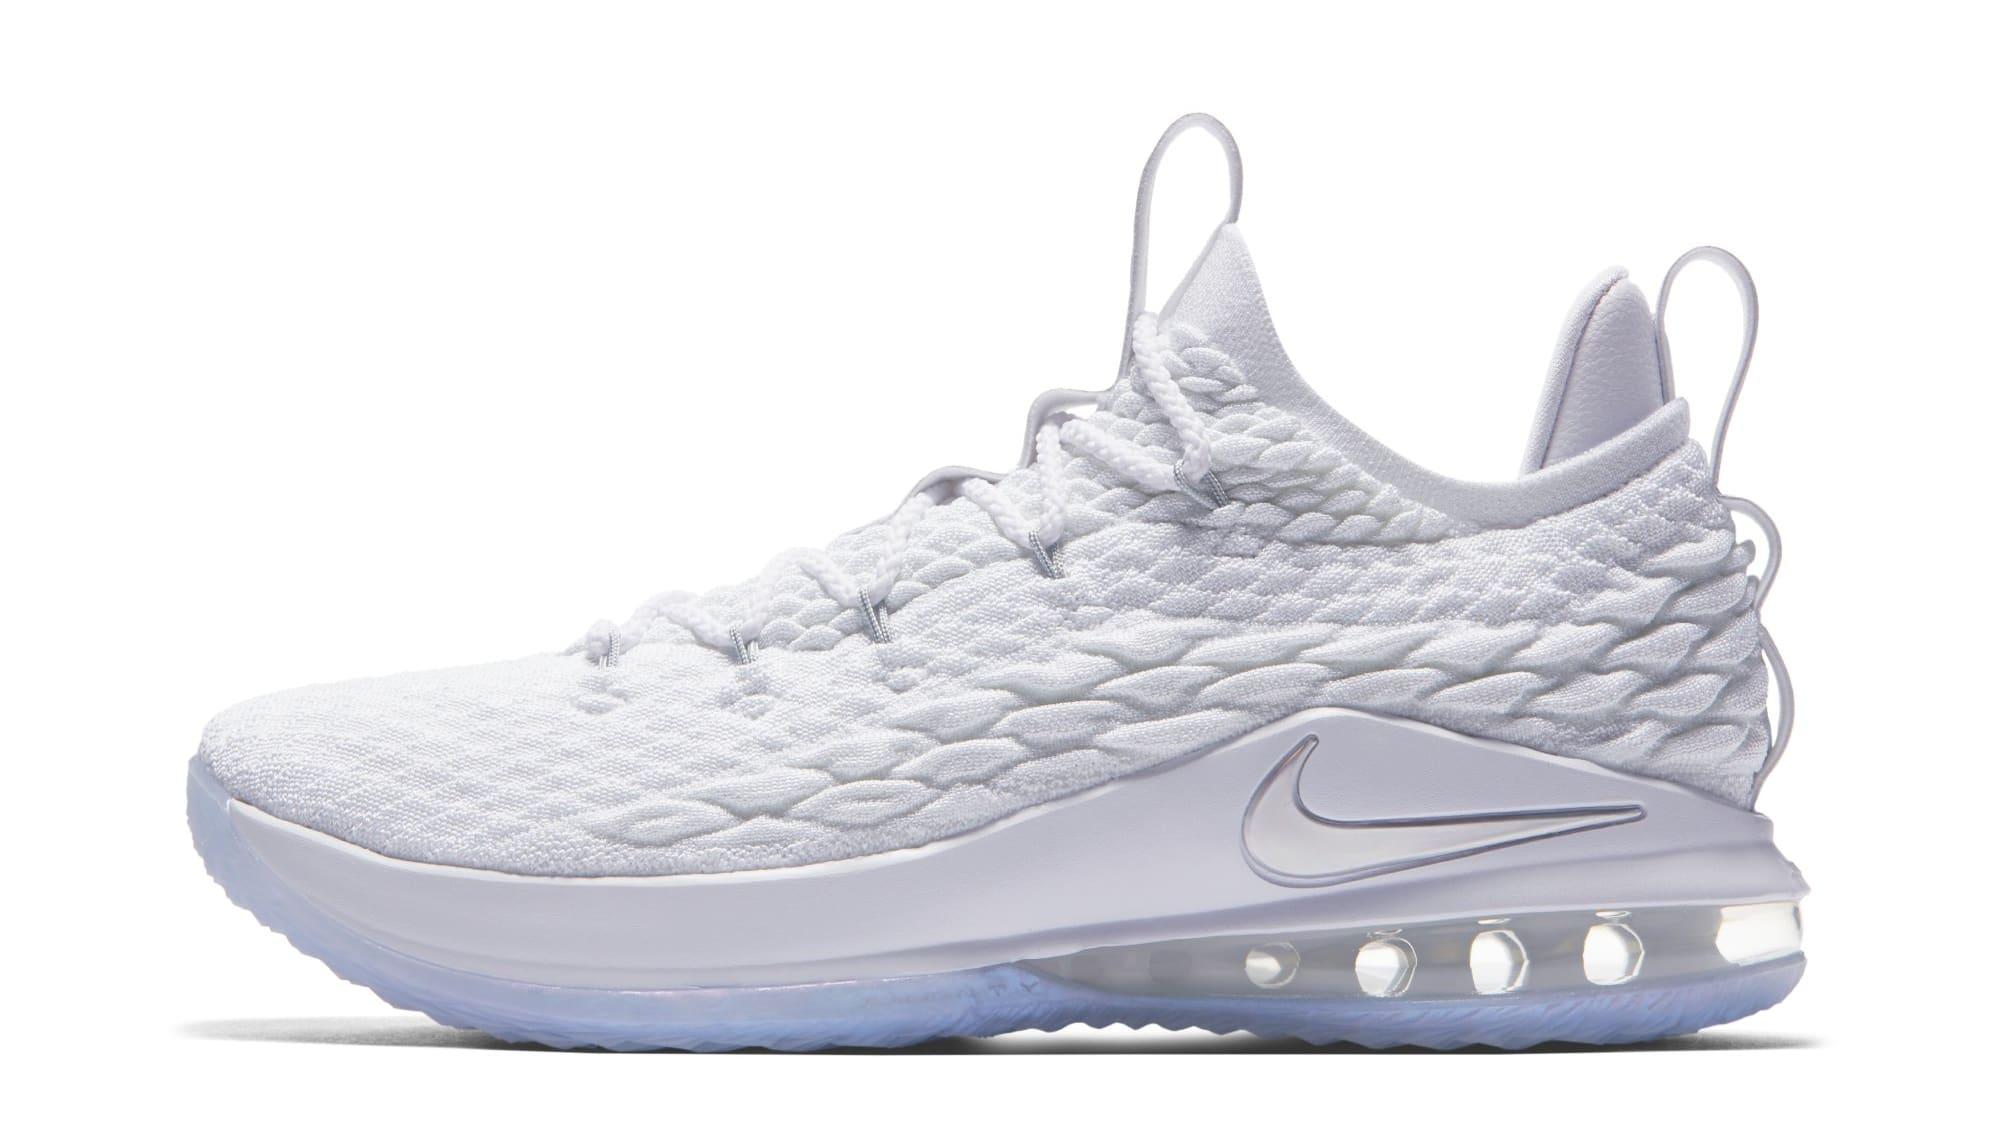 size 40 aa2bf bb6cd Nike LeBron 15 Low White Metallic Silver Release Date AO1755 ...